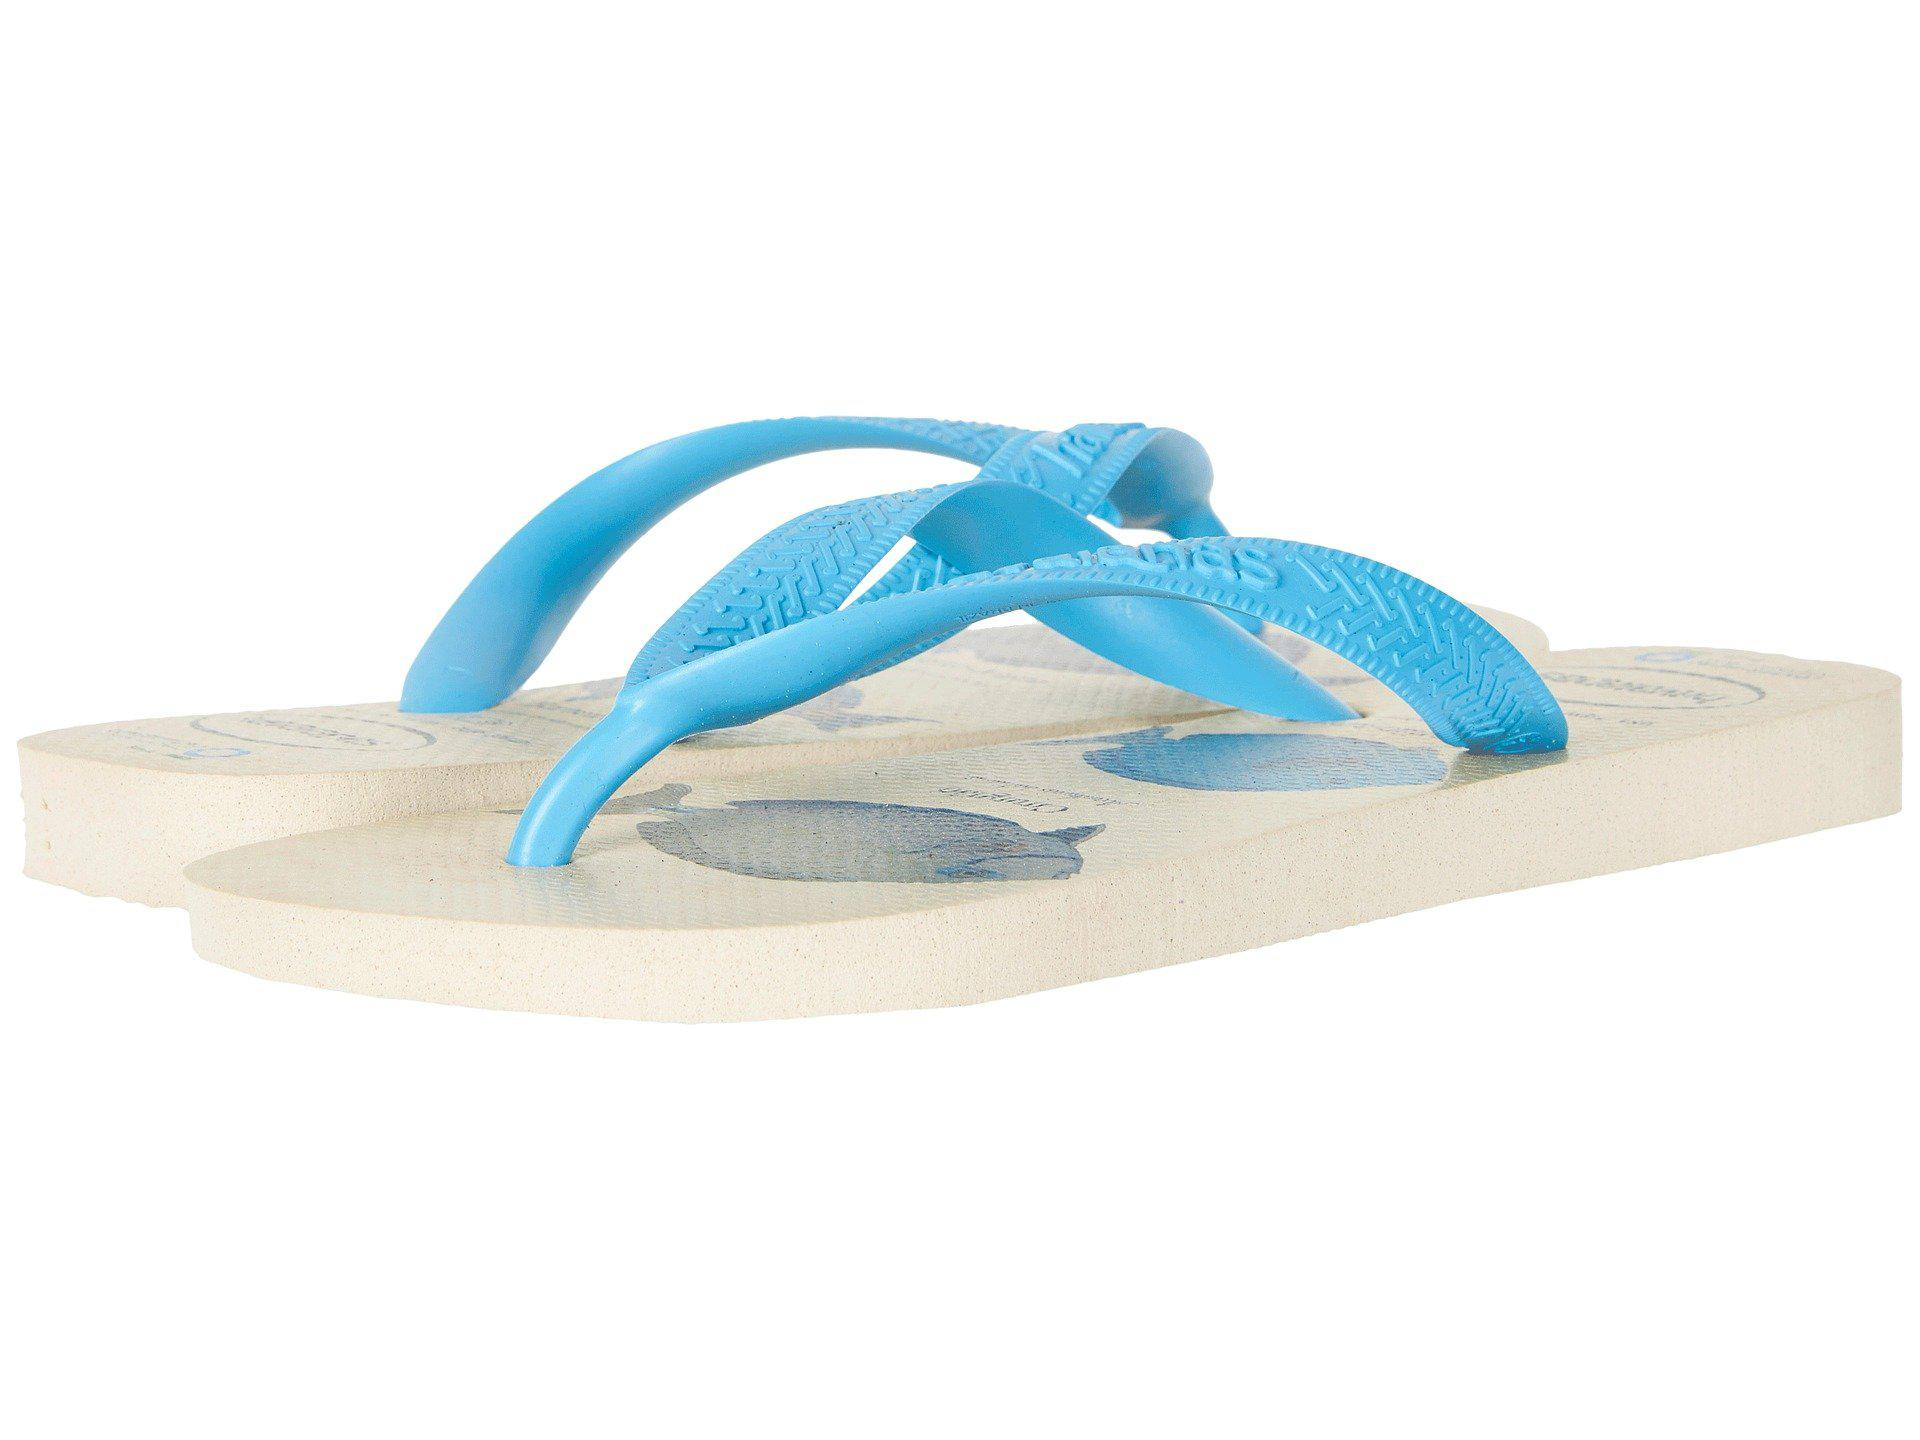 4835c7898 Lyst - Havaianas Conservation International Flip-flops in Blue for Men